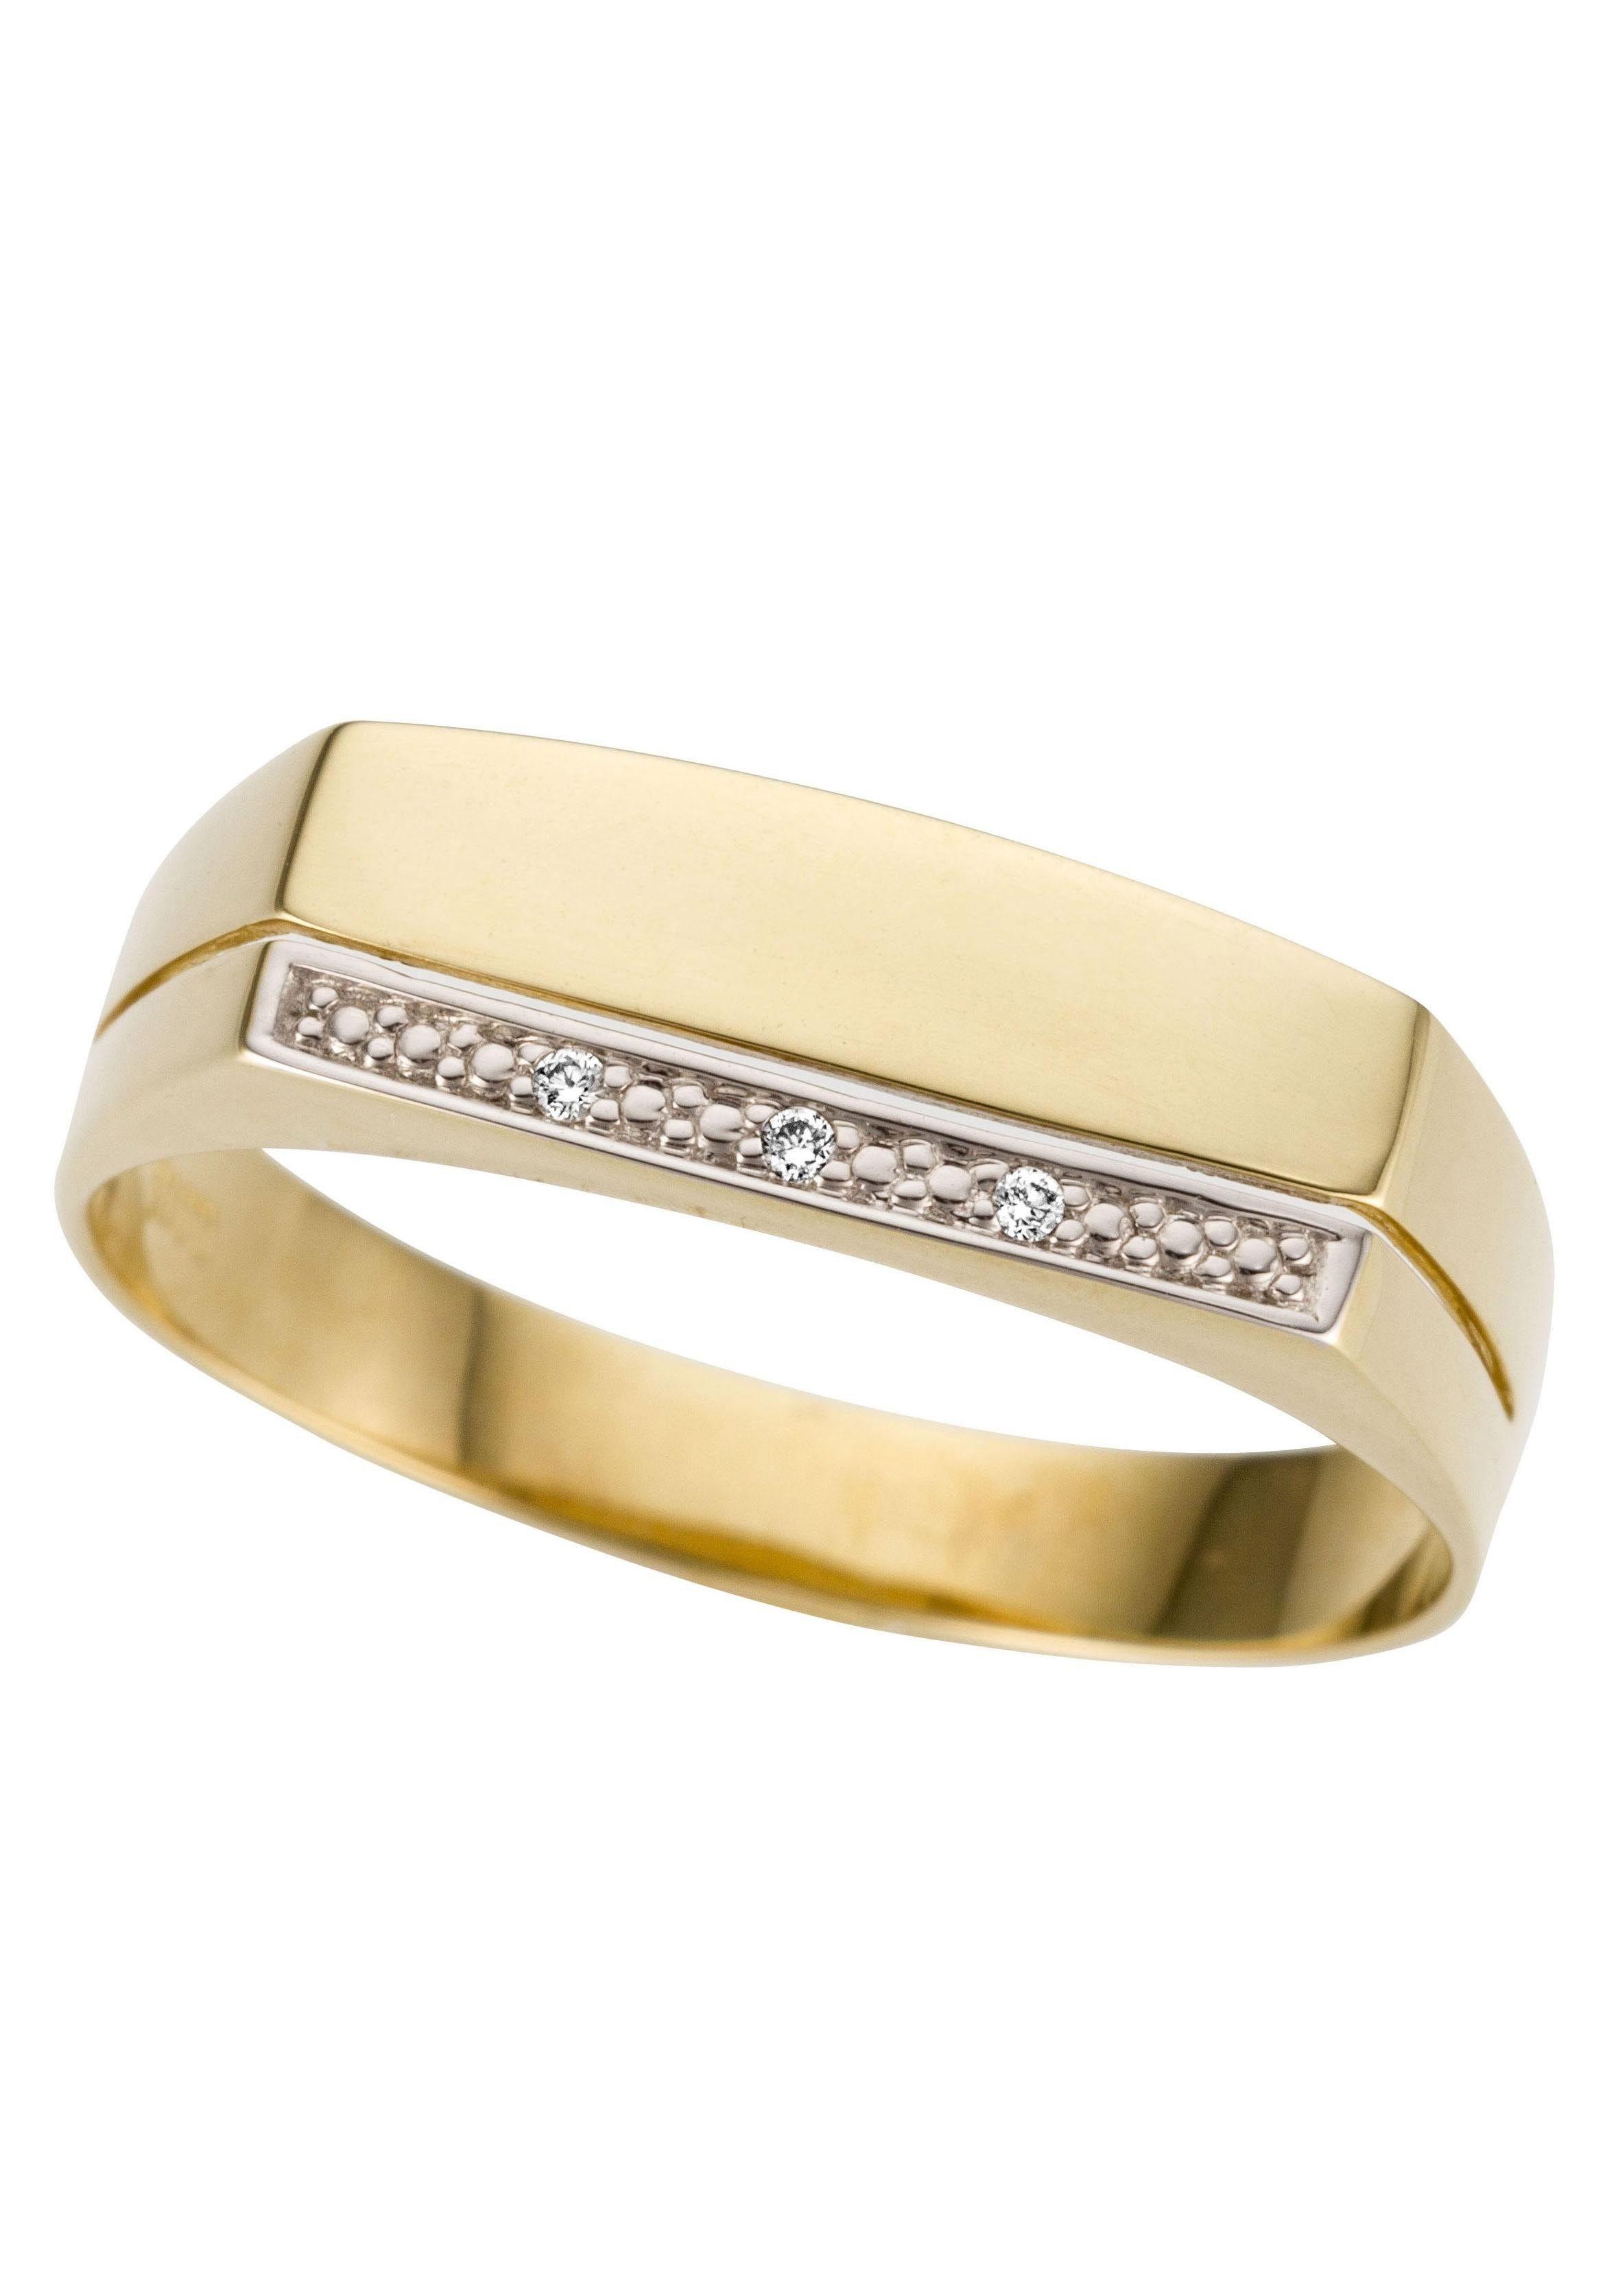 Firetti Goldring Siegelring bicolor glanz rhodinierte Fassung massiv Längsfuge | Schmuck > Ringe > Siegelringe | Goldfarben | Firetti